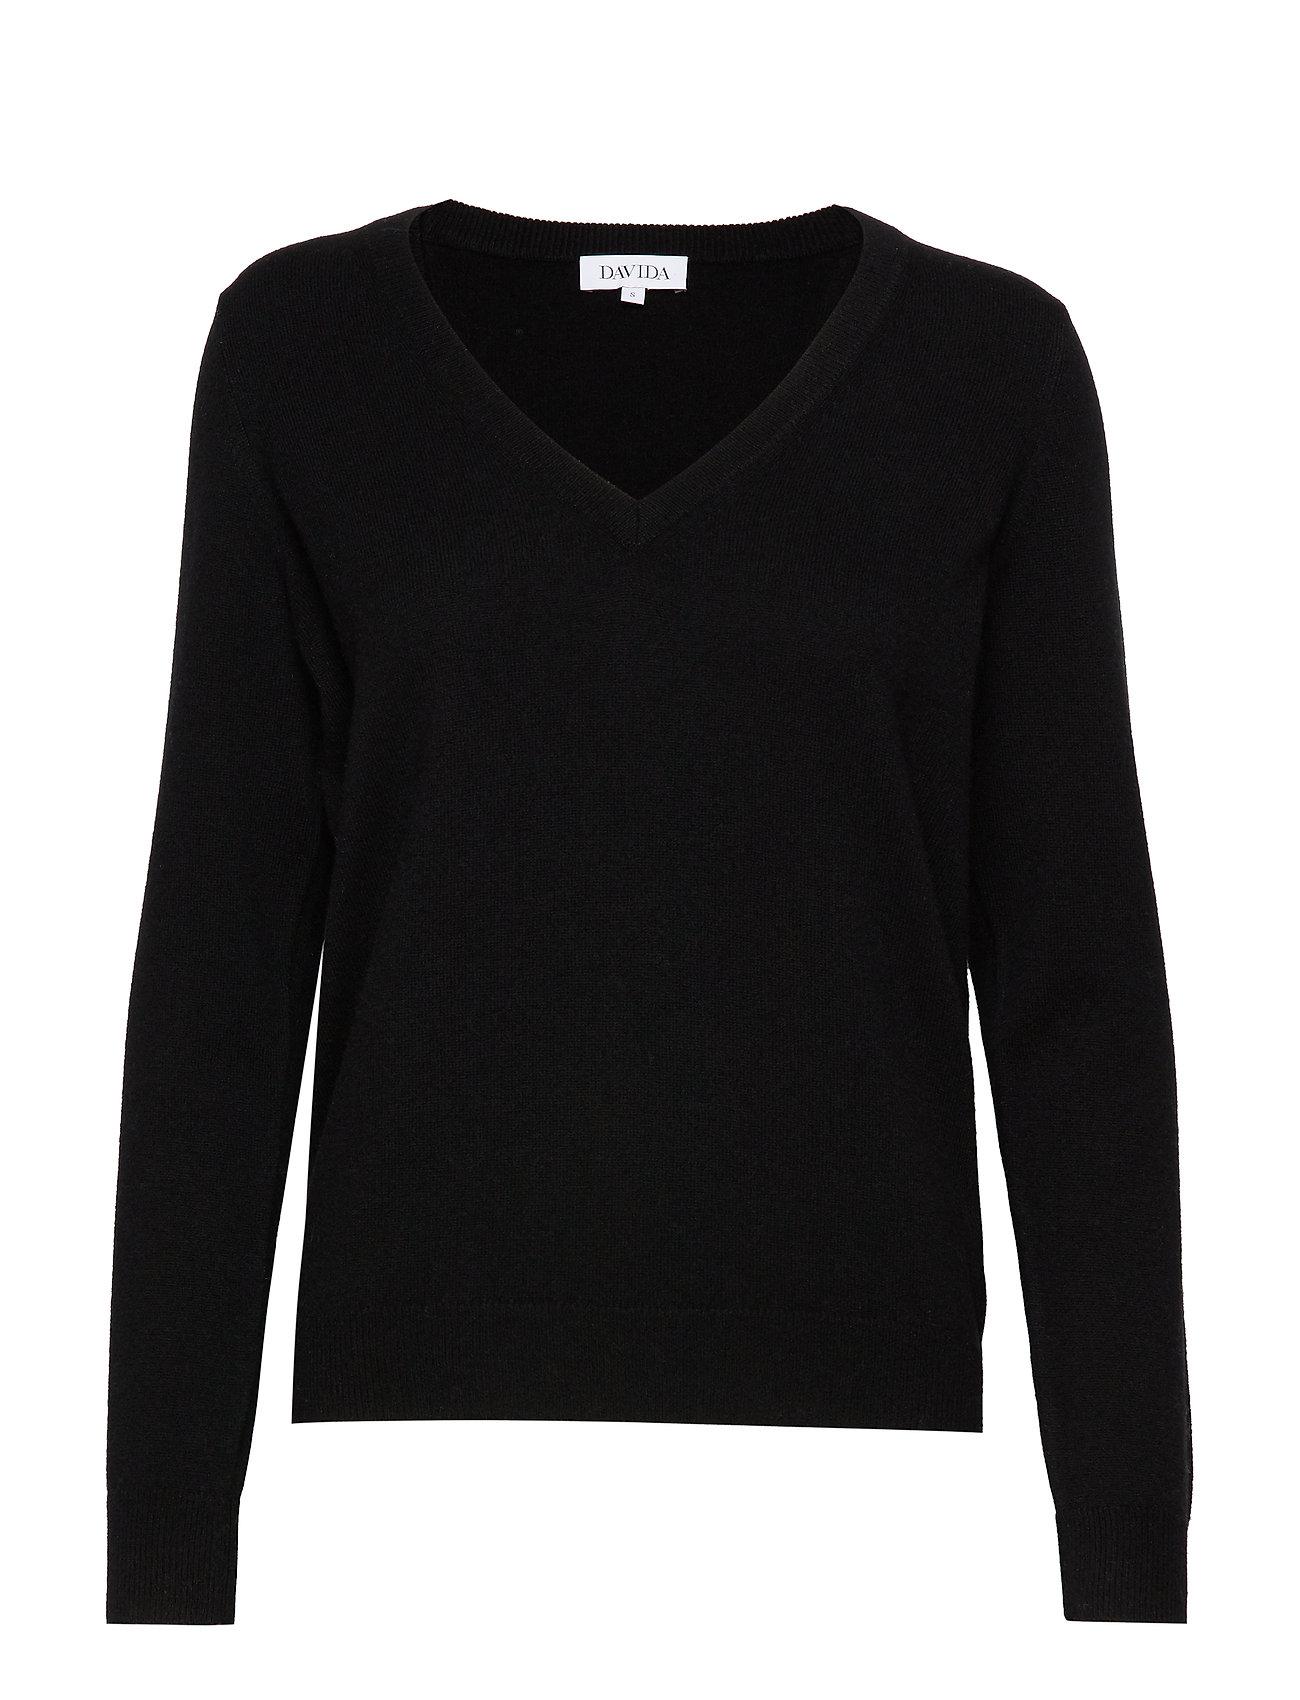 Davida Cashmere V-neck Loose Sweater - BLACK